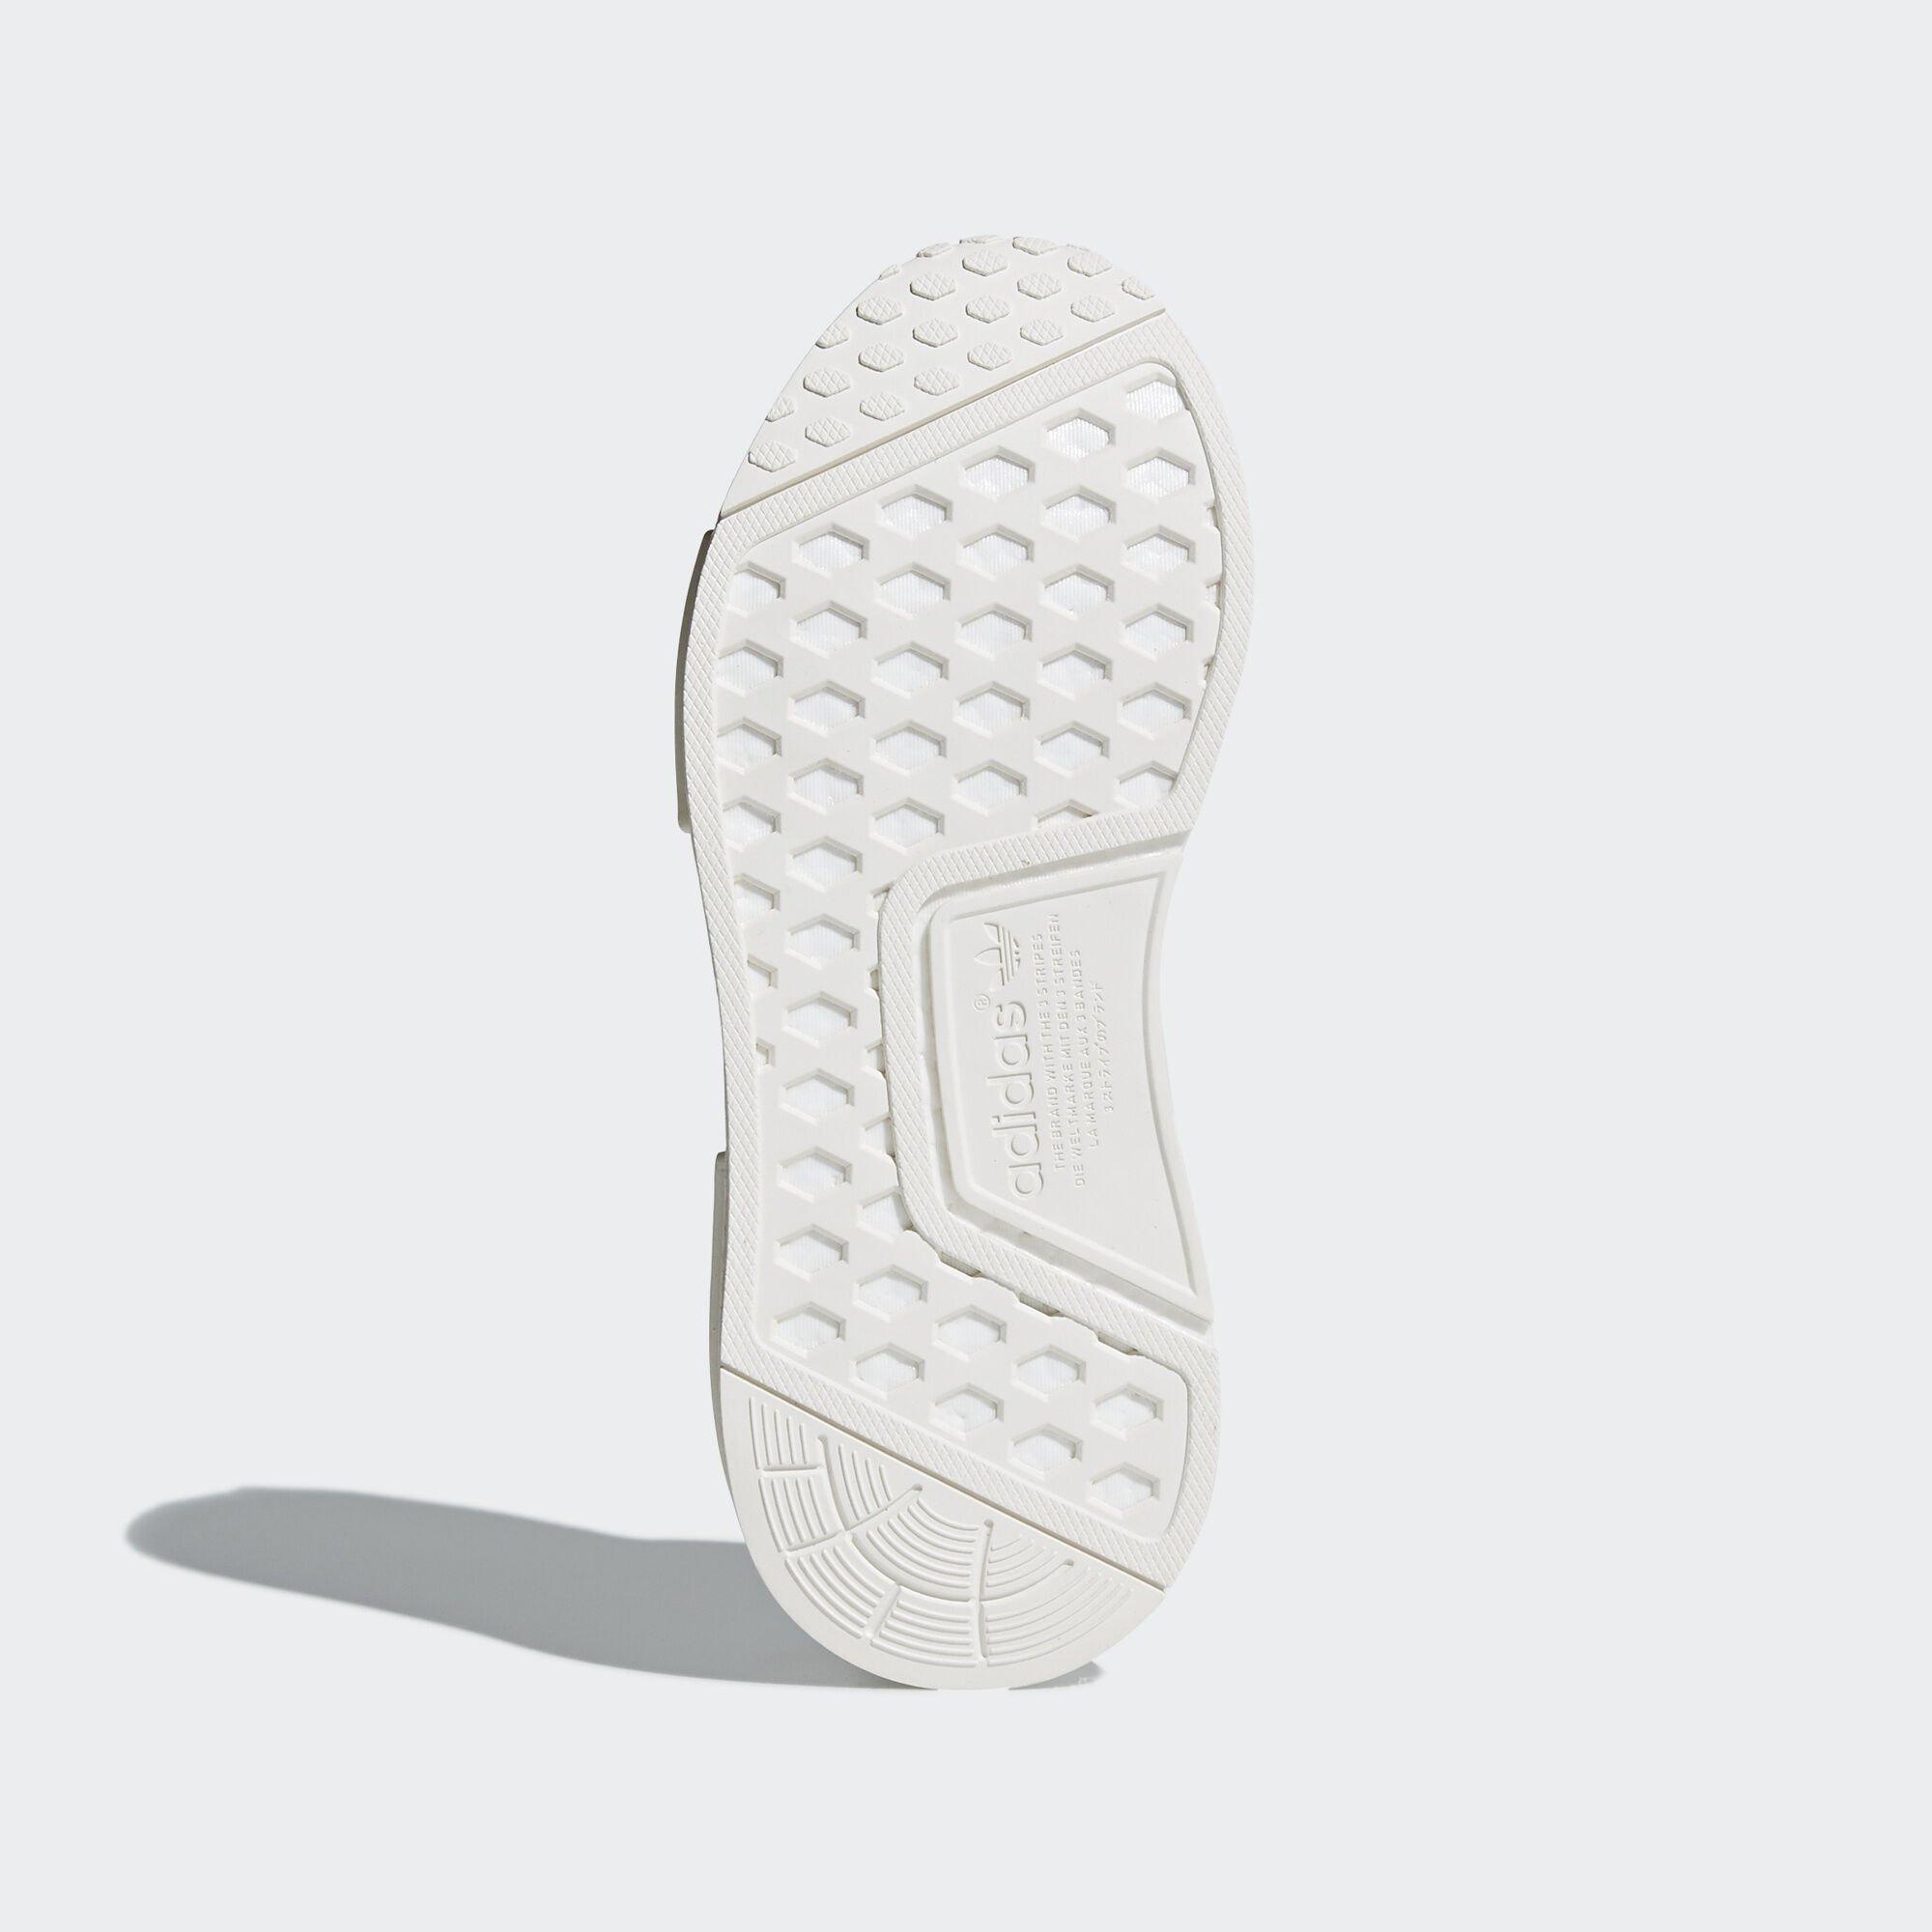 adidas NMD CS1 White Clear Orange (W) (AQ1136)